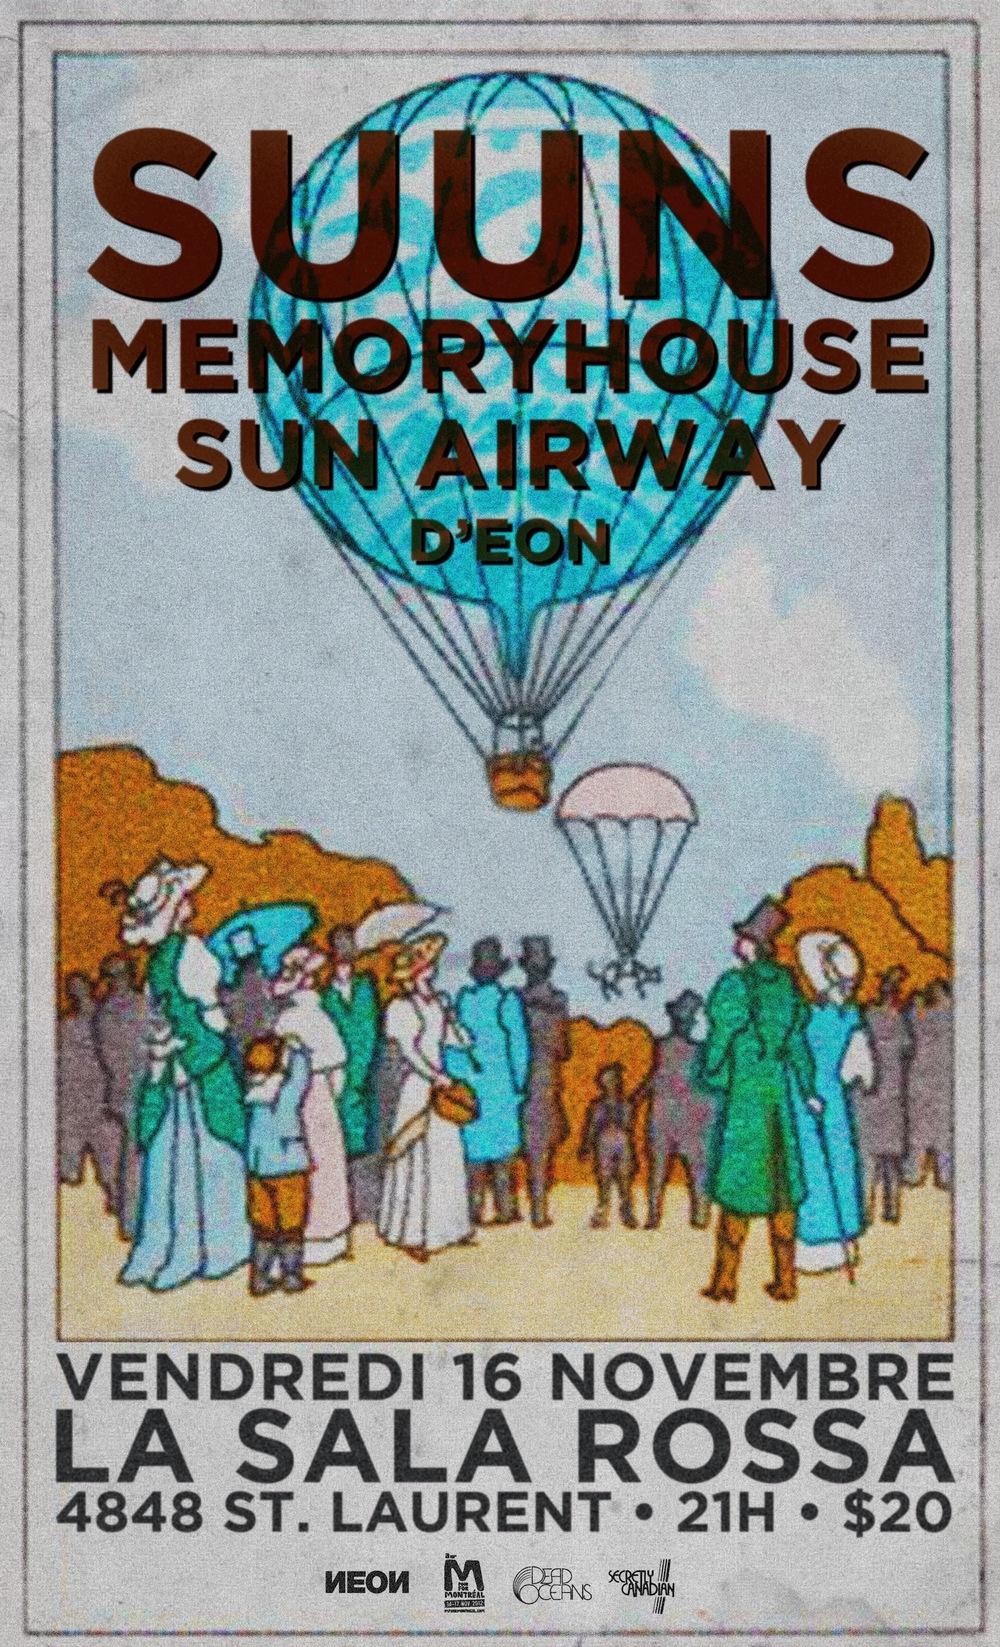 Suuns memoryhouse sun airway d'eon Montreal Sala rossa